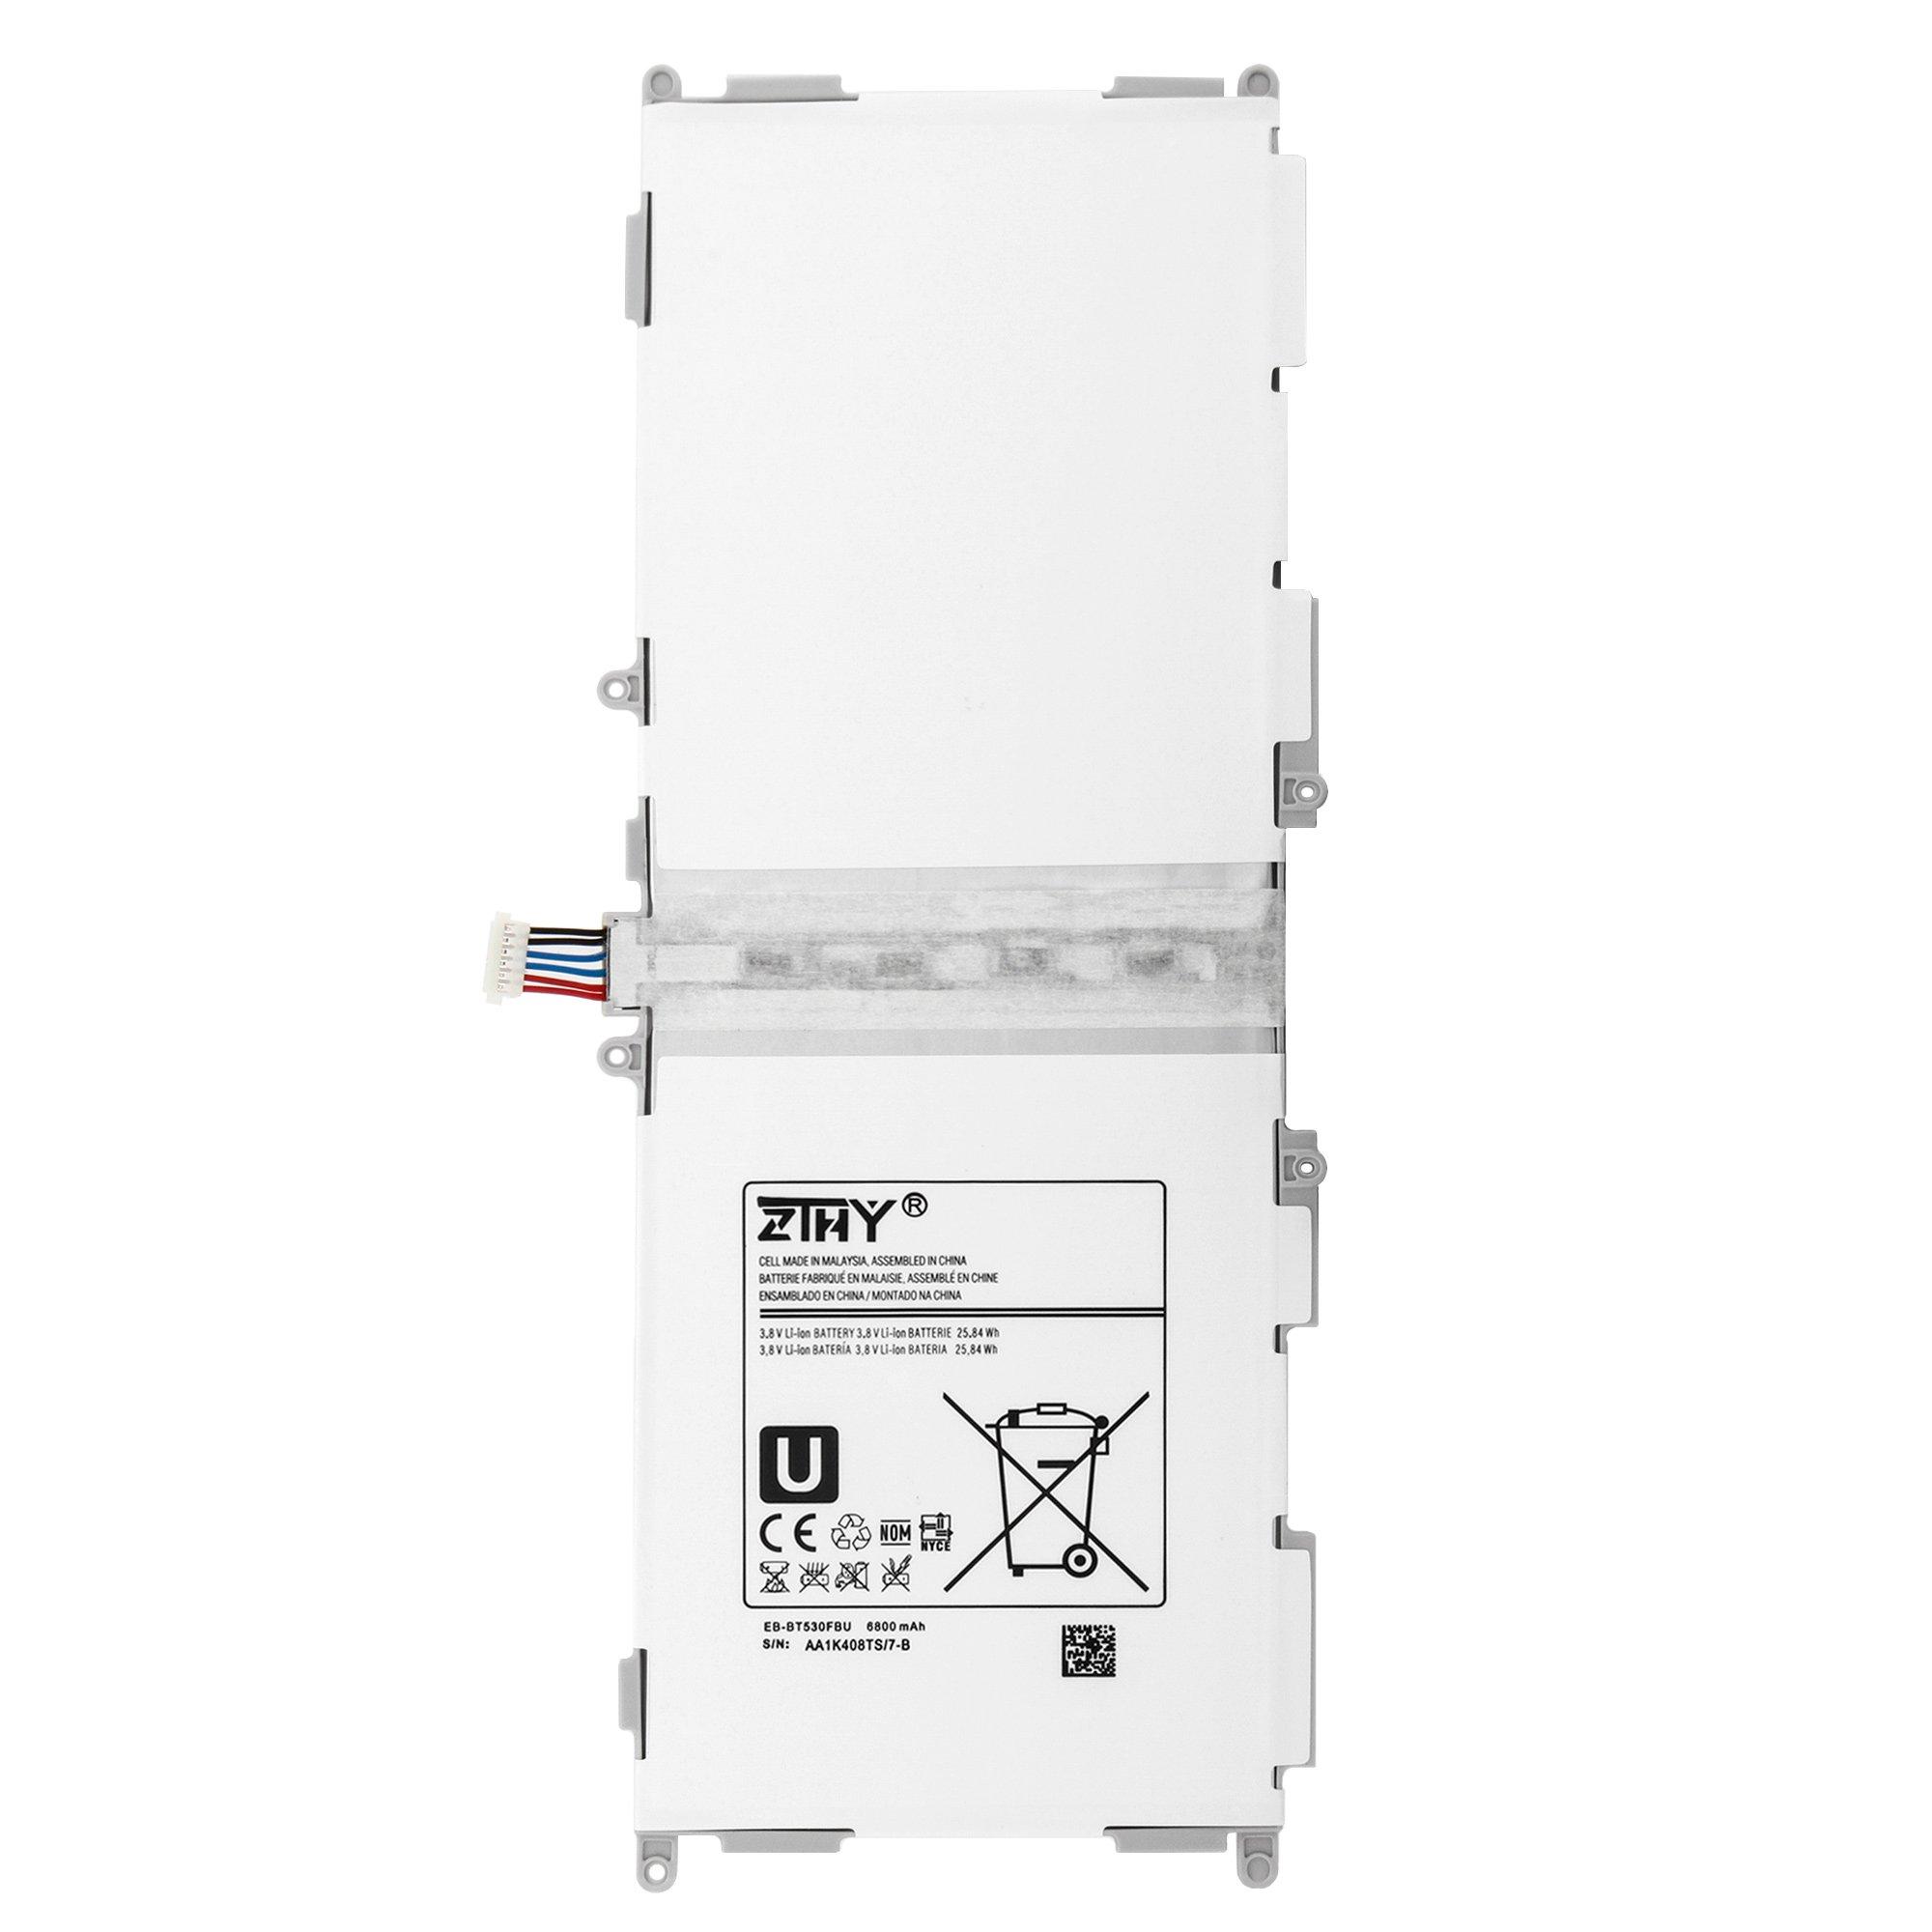 "New EB-BT530FBC Battery For Samsung Galaxy Tab 4 10.1/"" SM-T530 SM-T530NU 6800mAh"